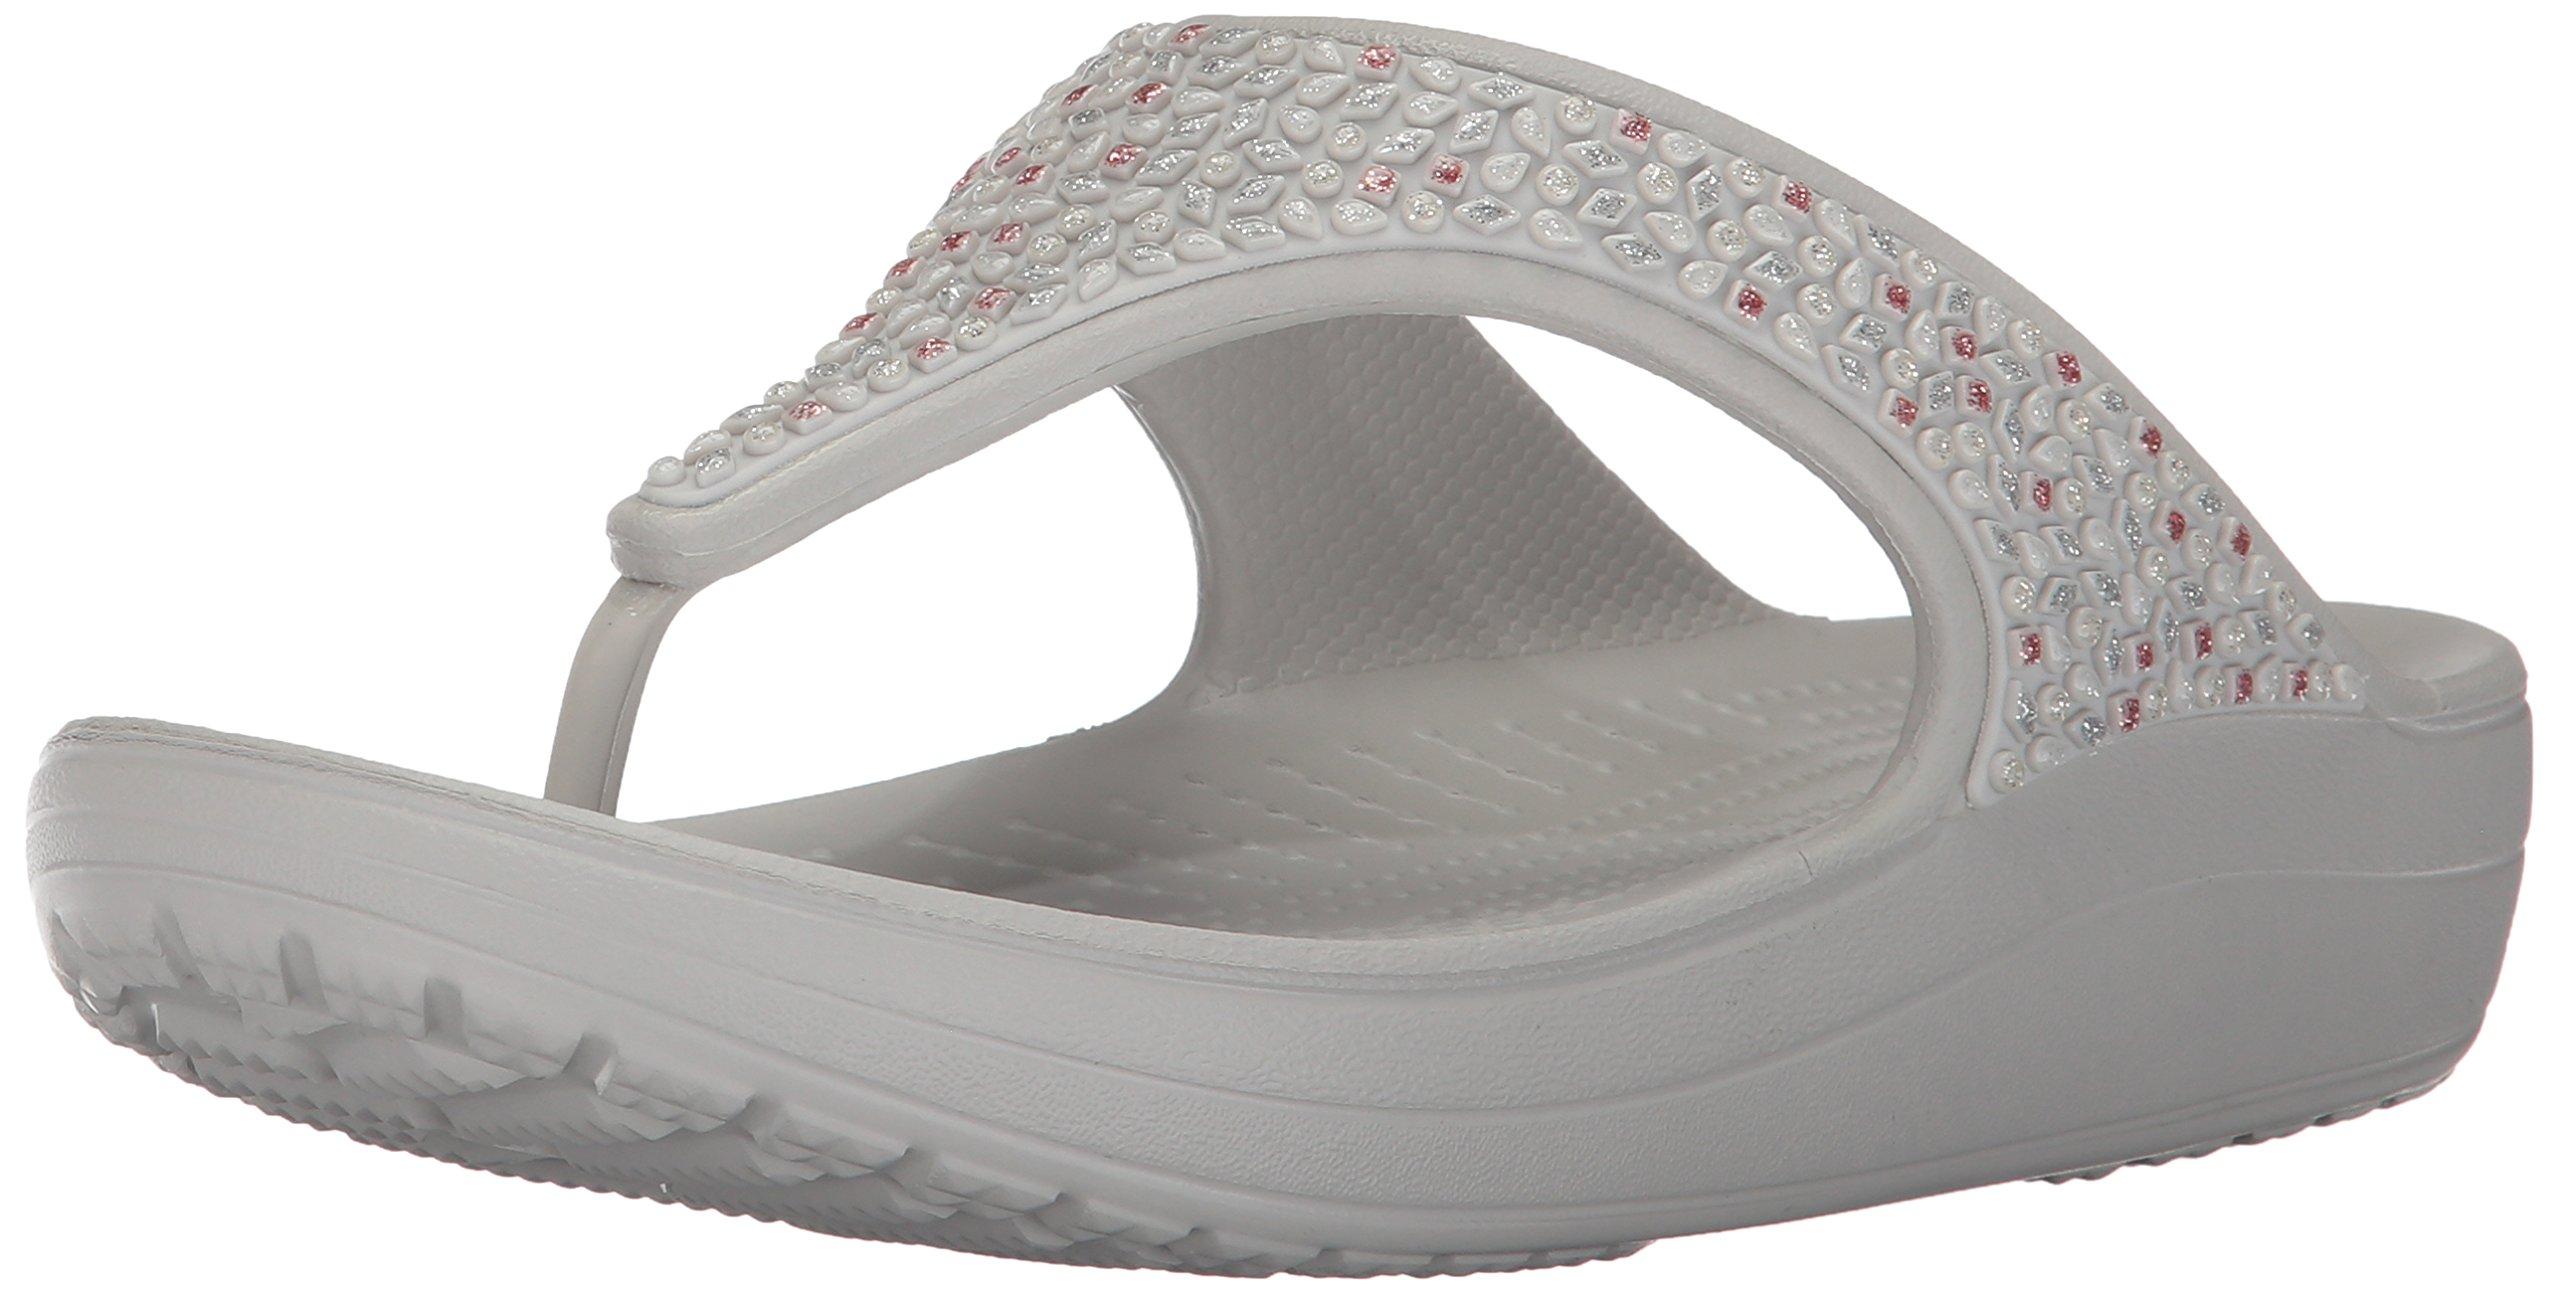 7965d5a3a1e9 Galleon - Crocs Women s Sloane Embellished Flip Flop